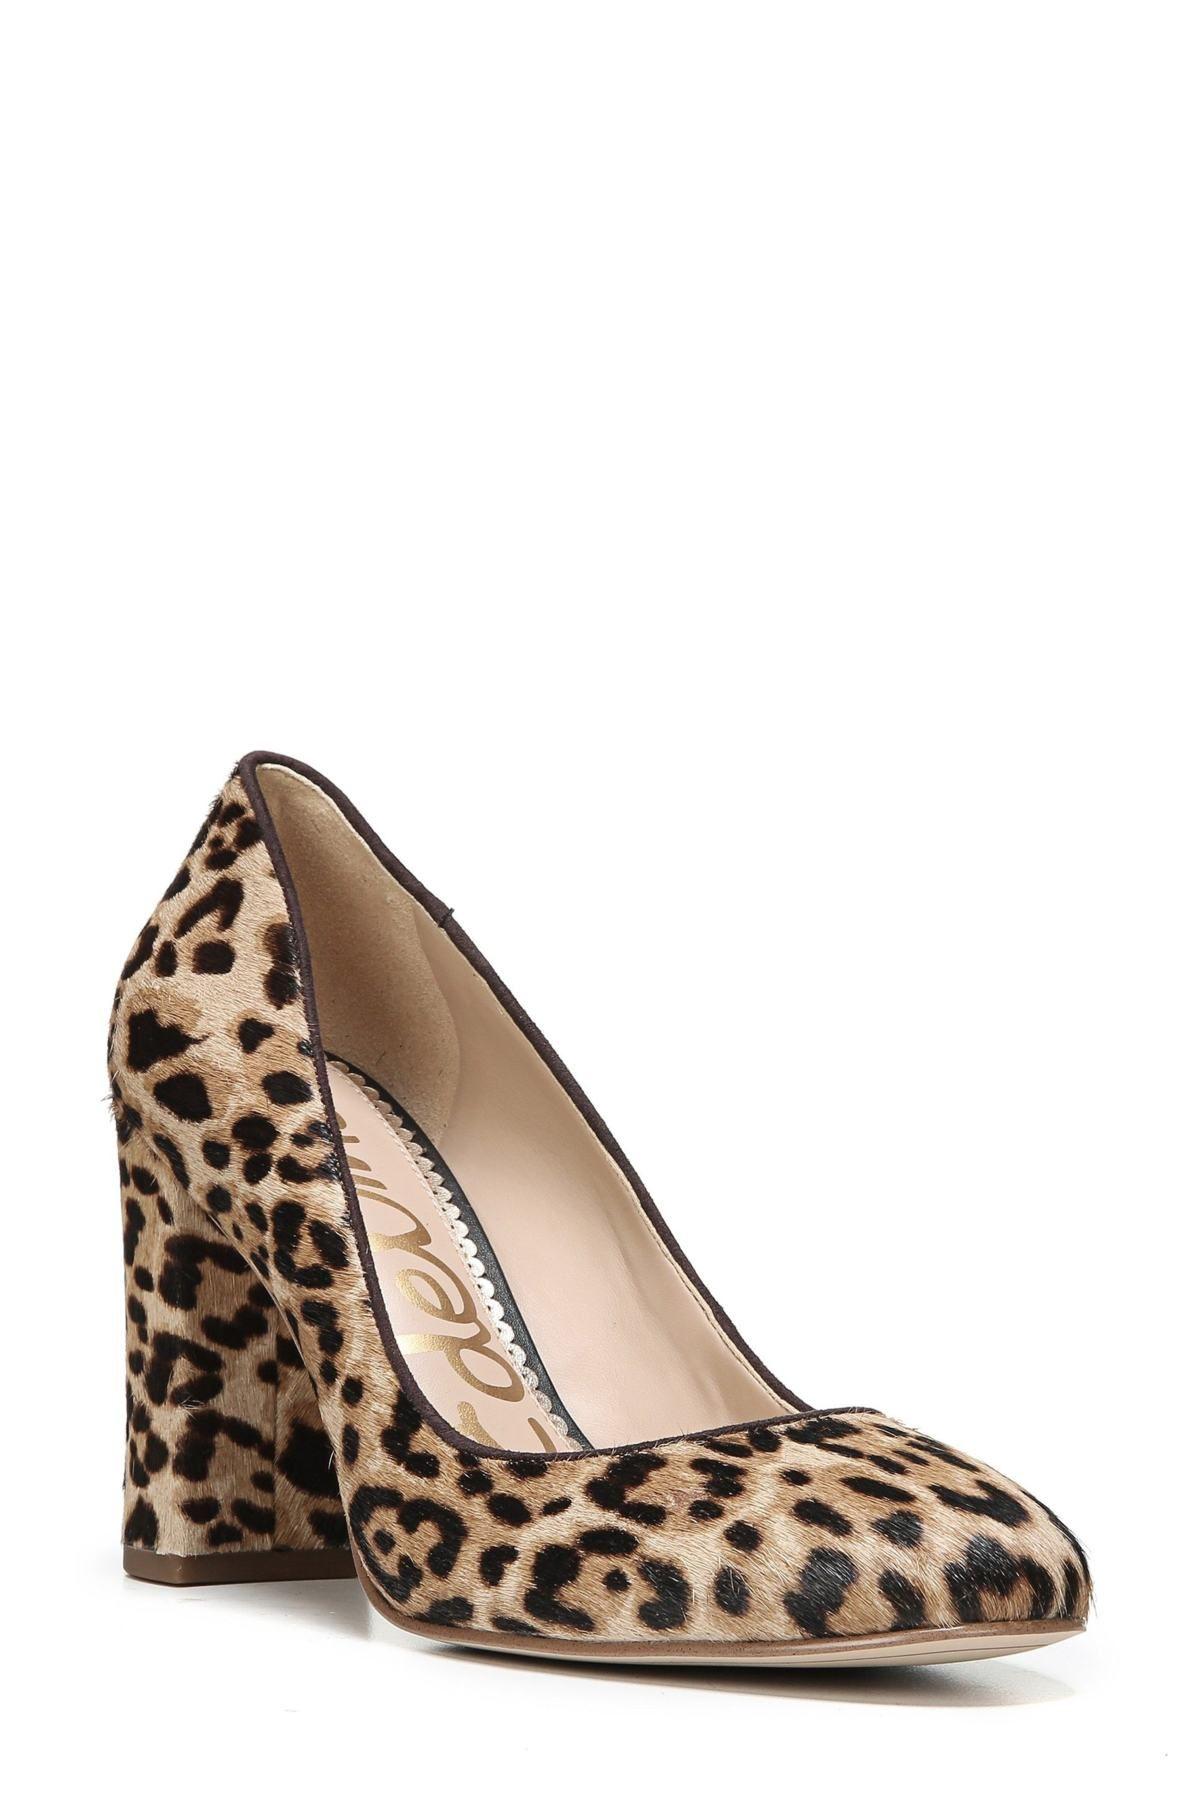 best sneakers 5577a a69c8 Sam Edelman | Stillson Pump | scarpe | Women's pumps, Shoes